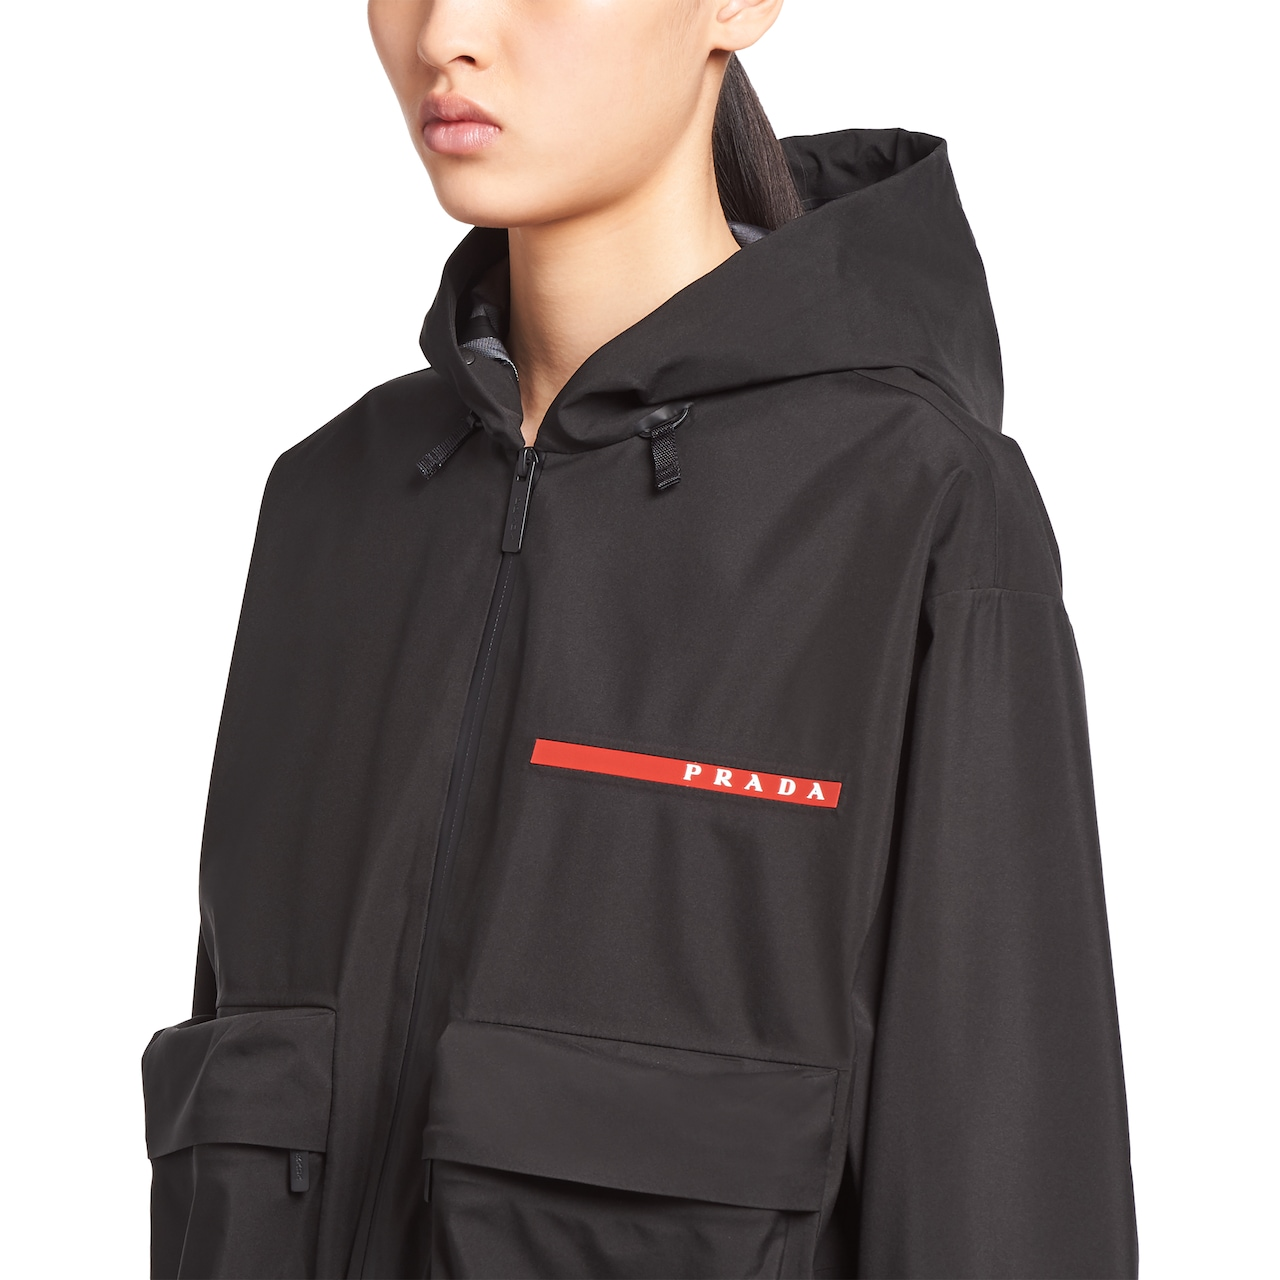 Prada LR-MX026 织物外套 5